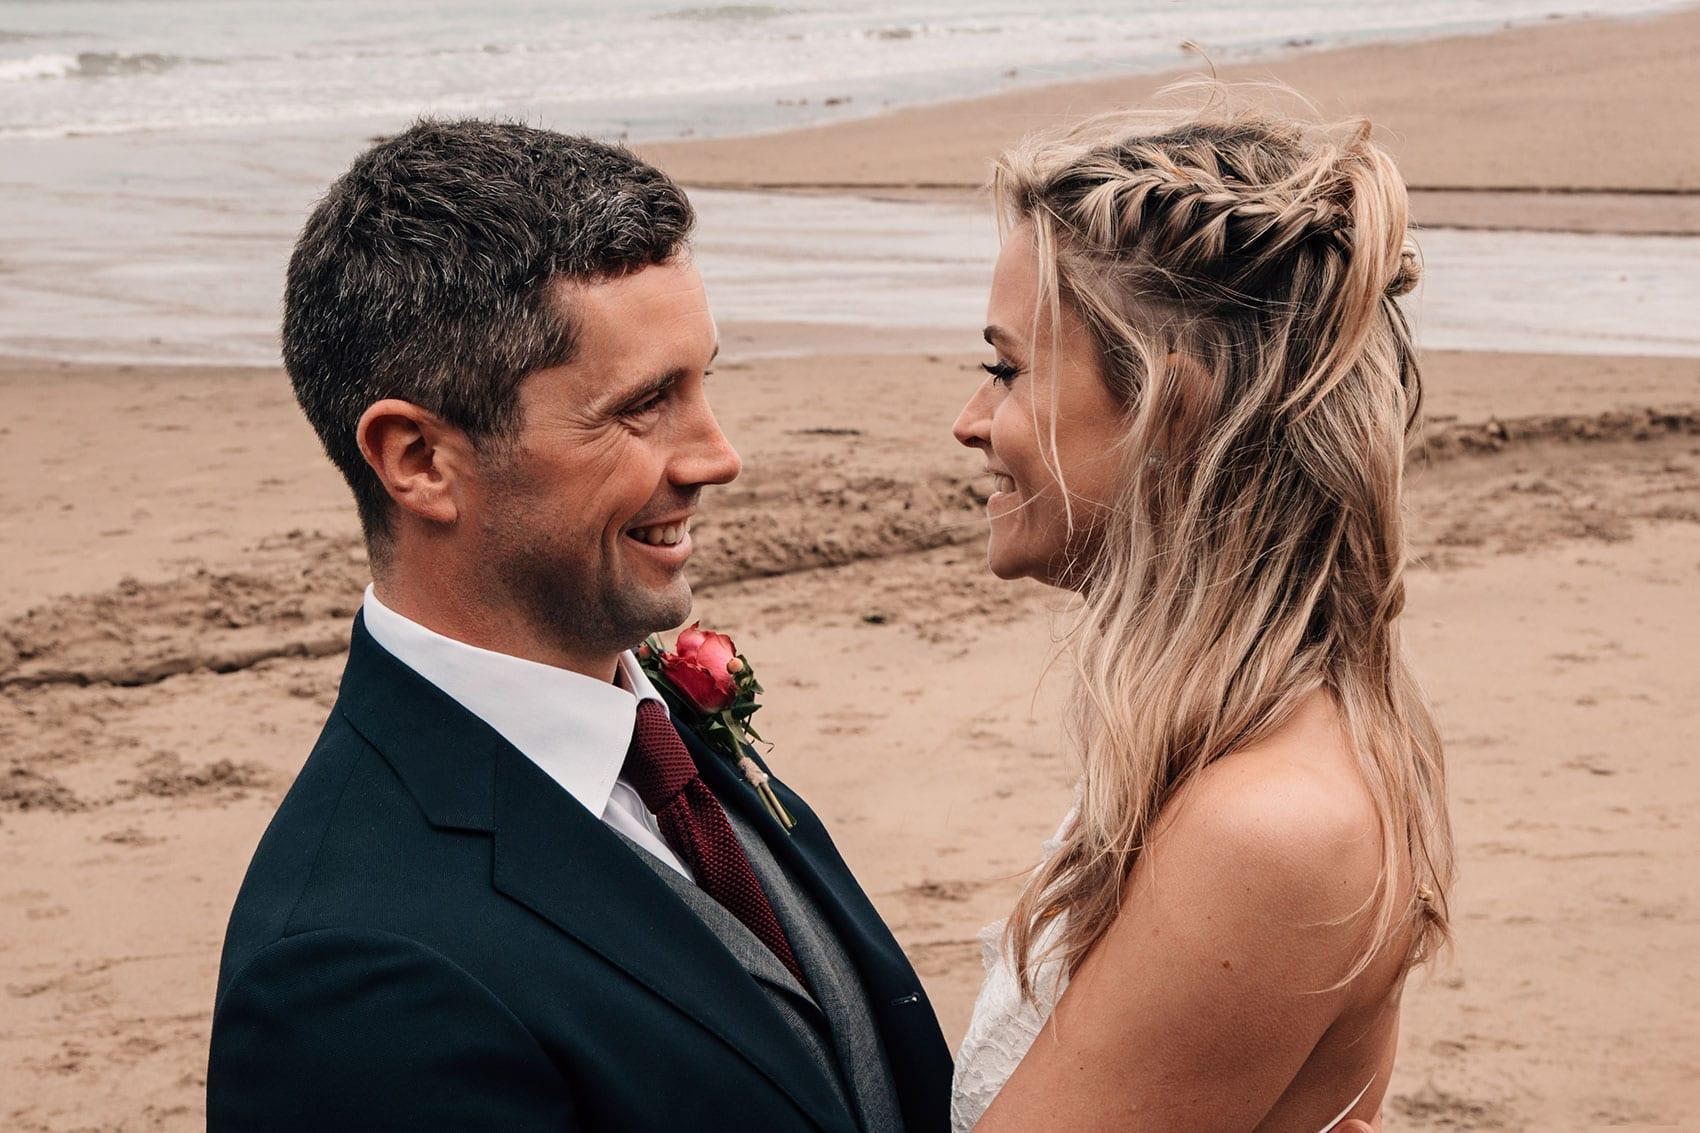 adventurous couples wedding photography